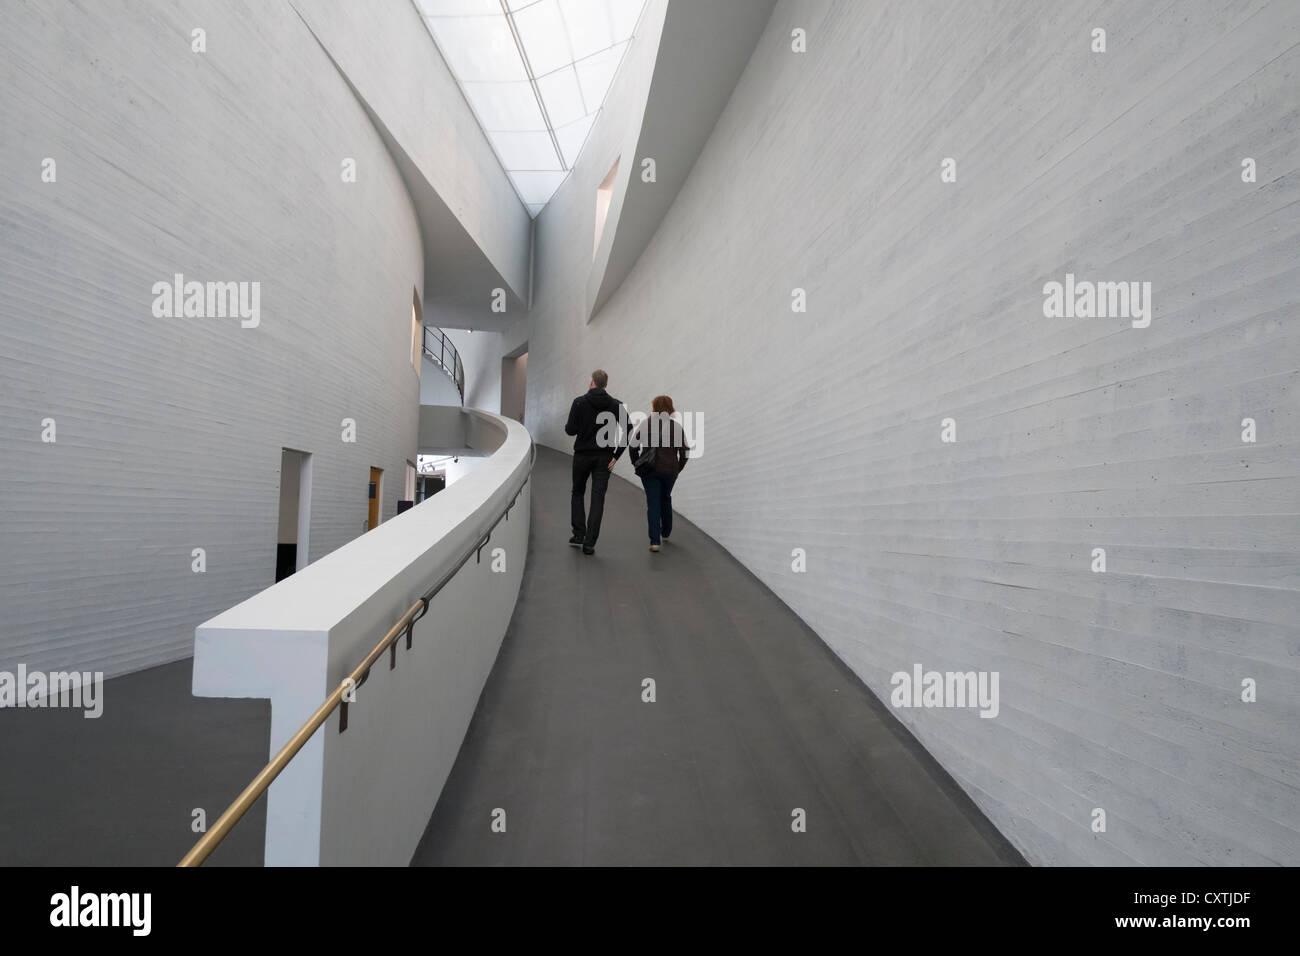 Interior of Kiasma contemporary art museum in Helsinki Finland - Stock Image